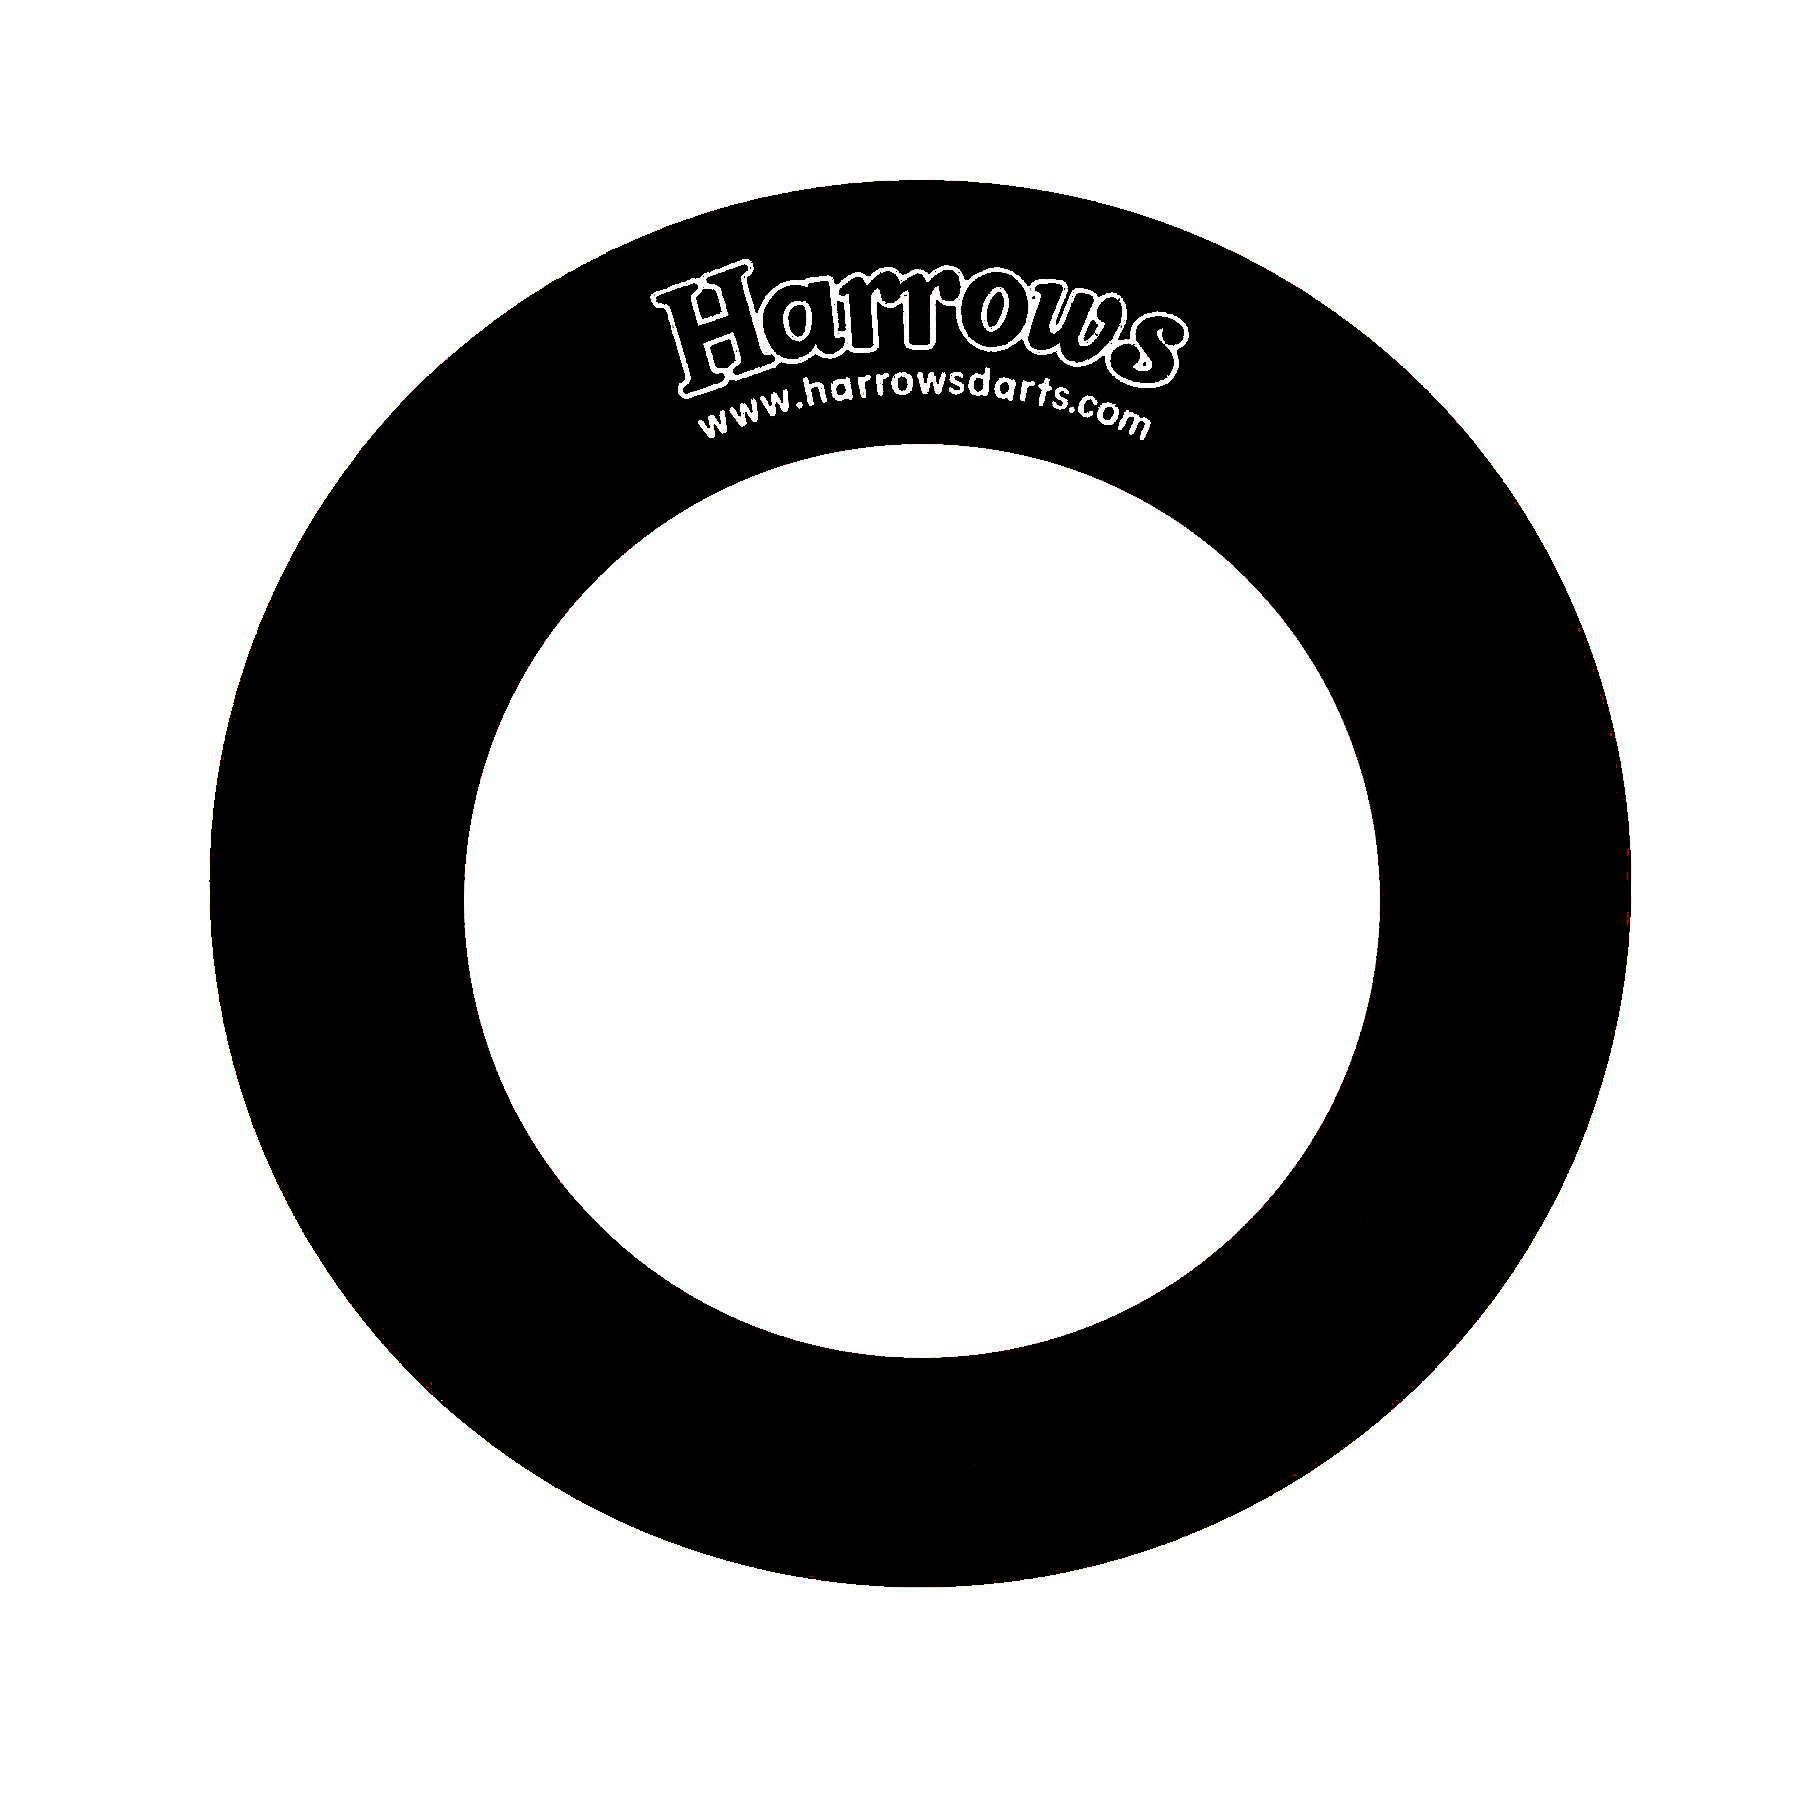 Harrows Dart-Board Wandschutz schwarz